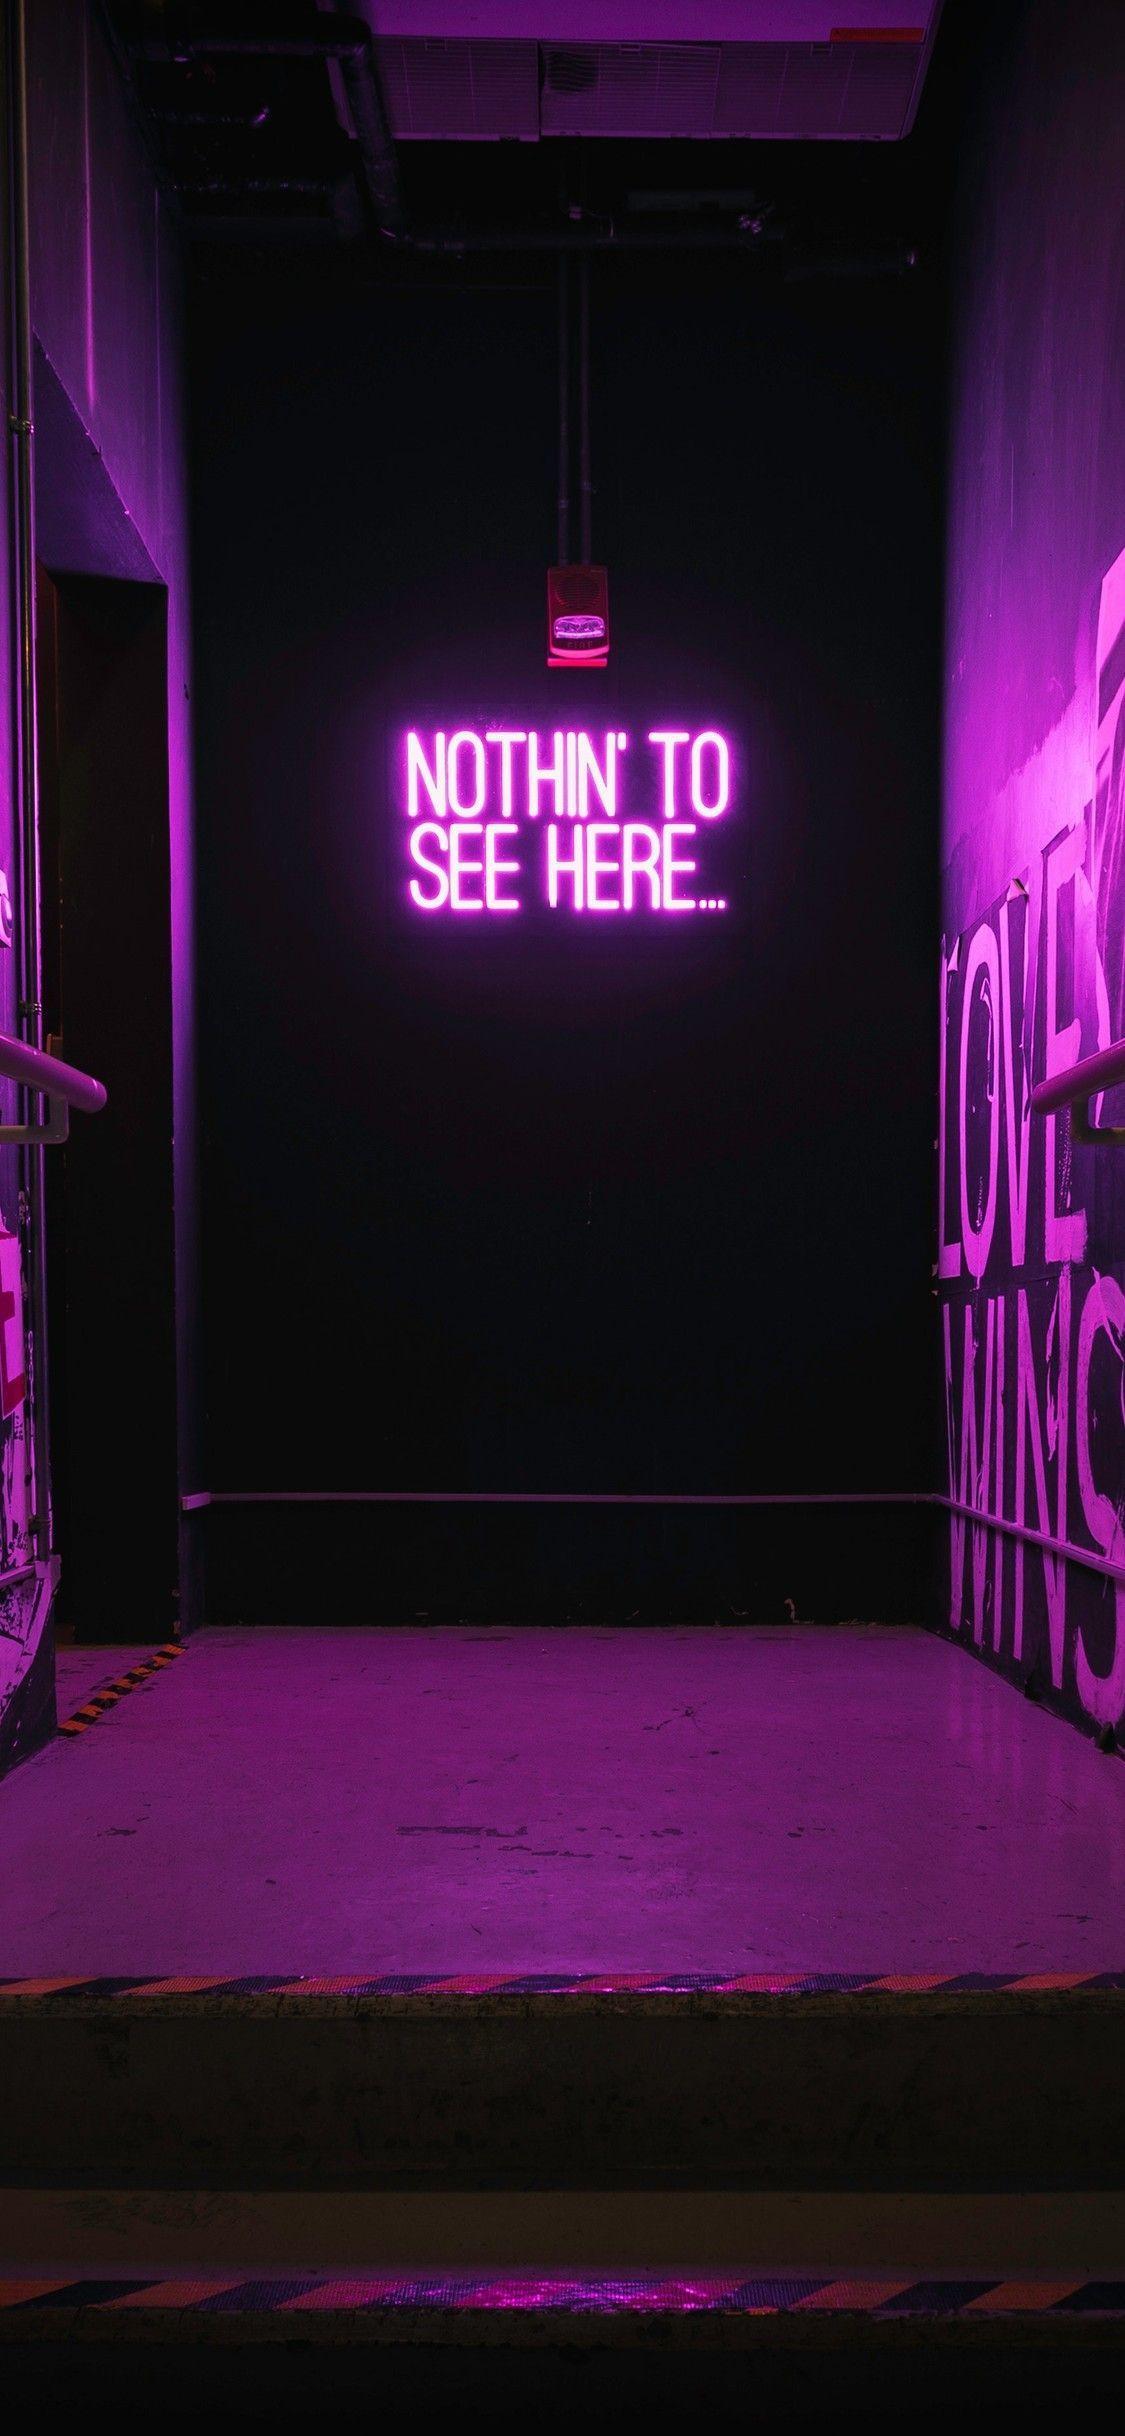 Aesthetic Neon iPhone Wallpapers ...